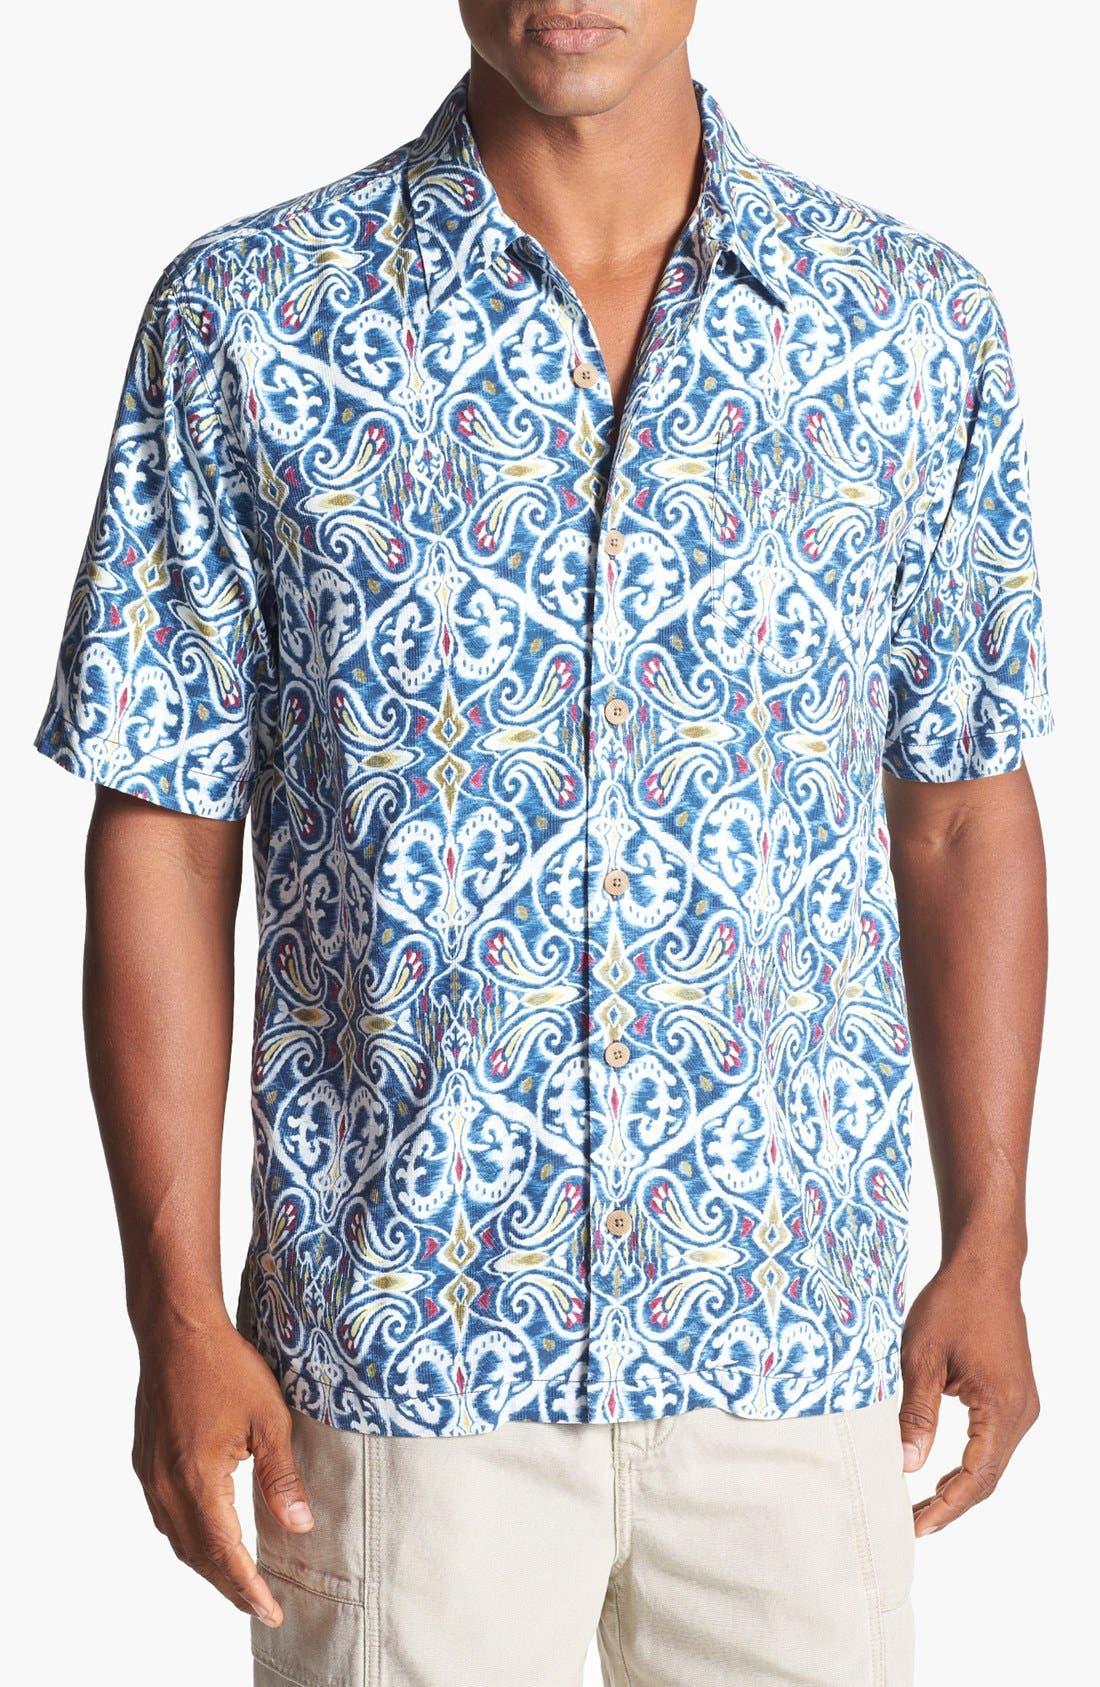 Alternate Image 1 Selected - Tommy Bahama 'Aziza' Ikat Silk Campshirt